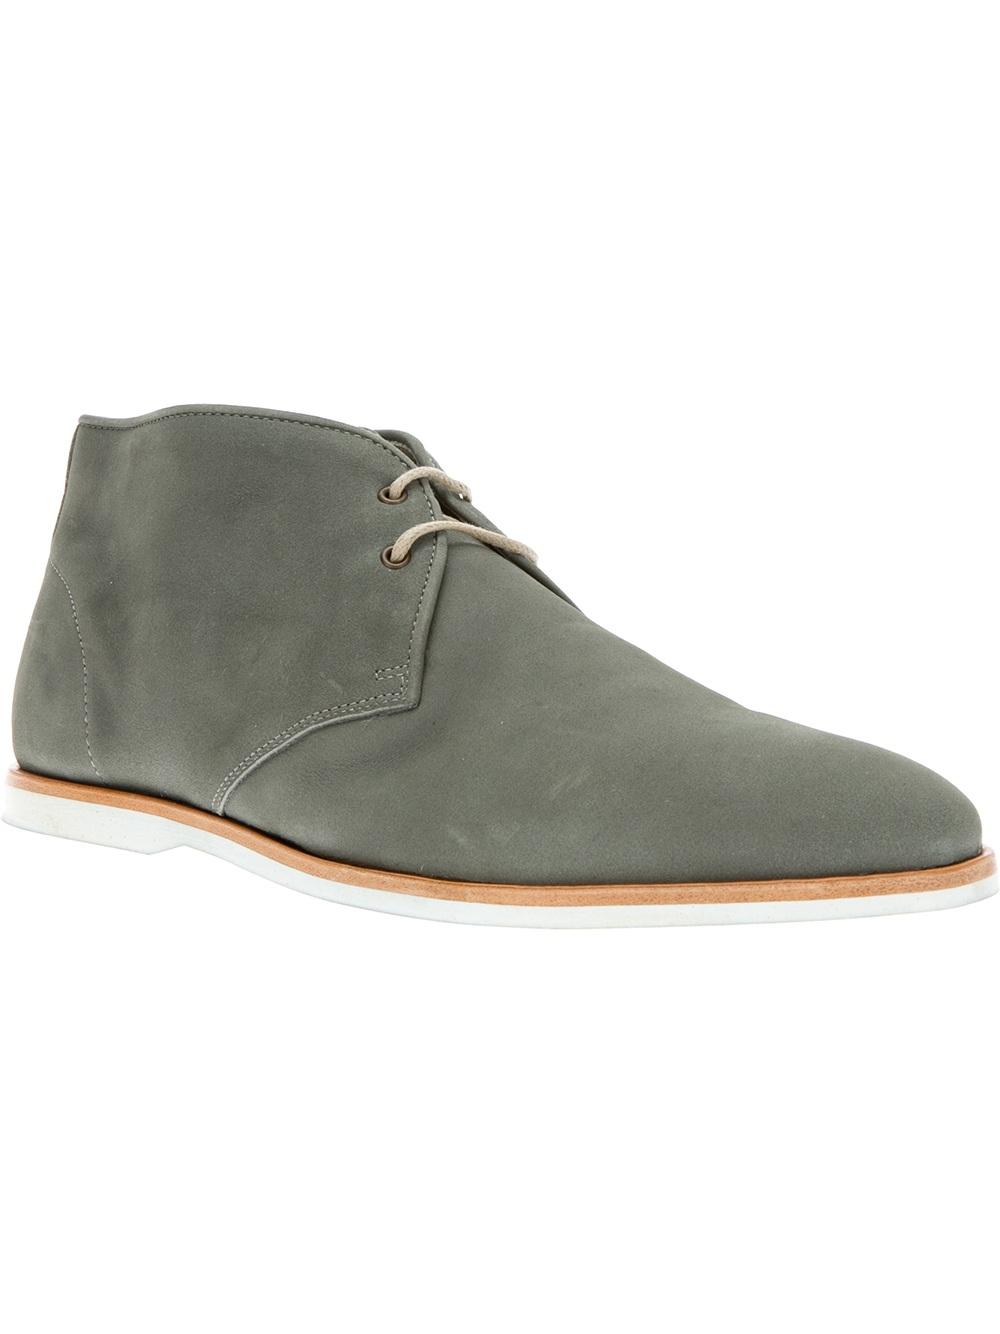 Mr Men Shoe Boot